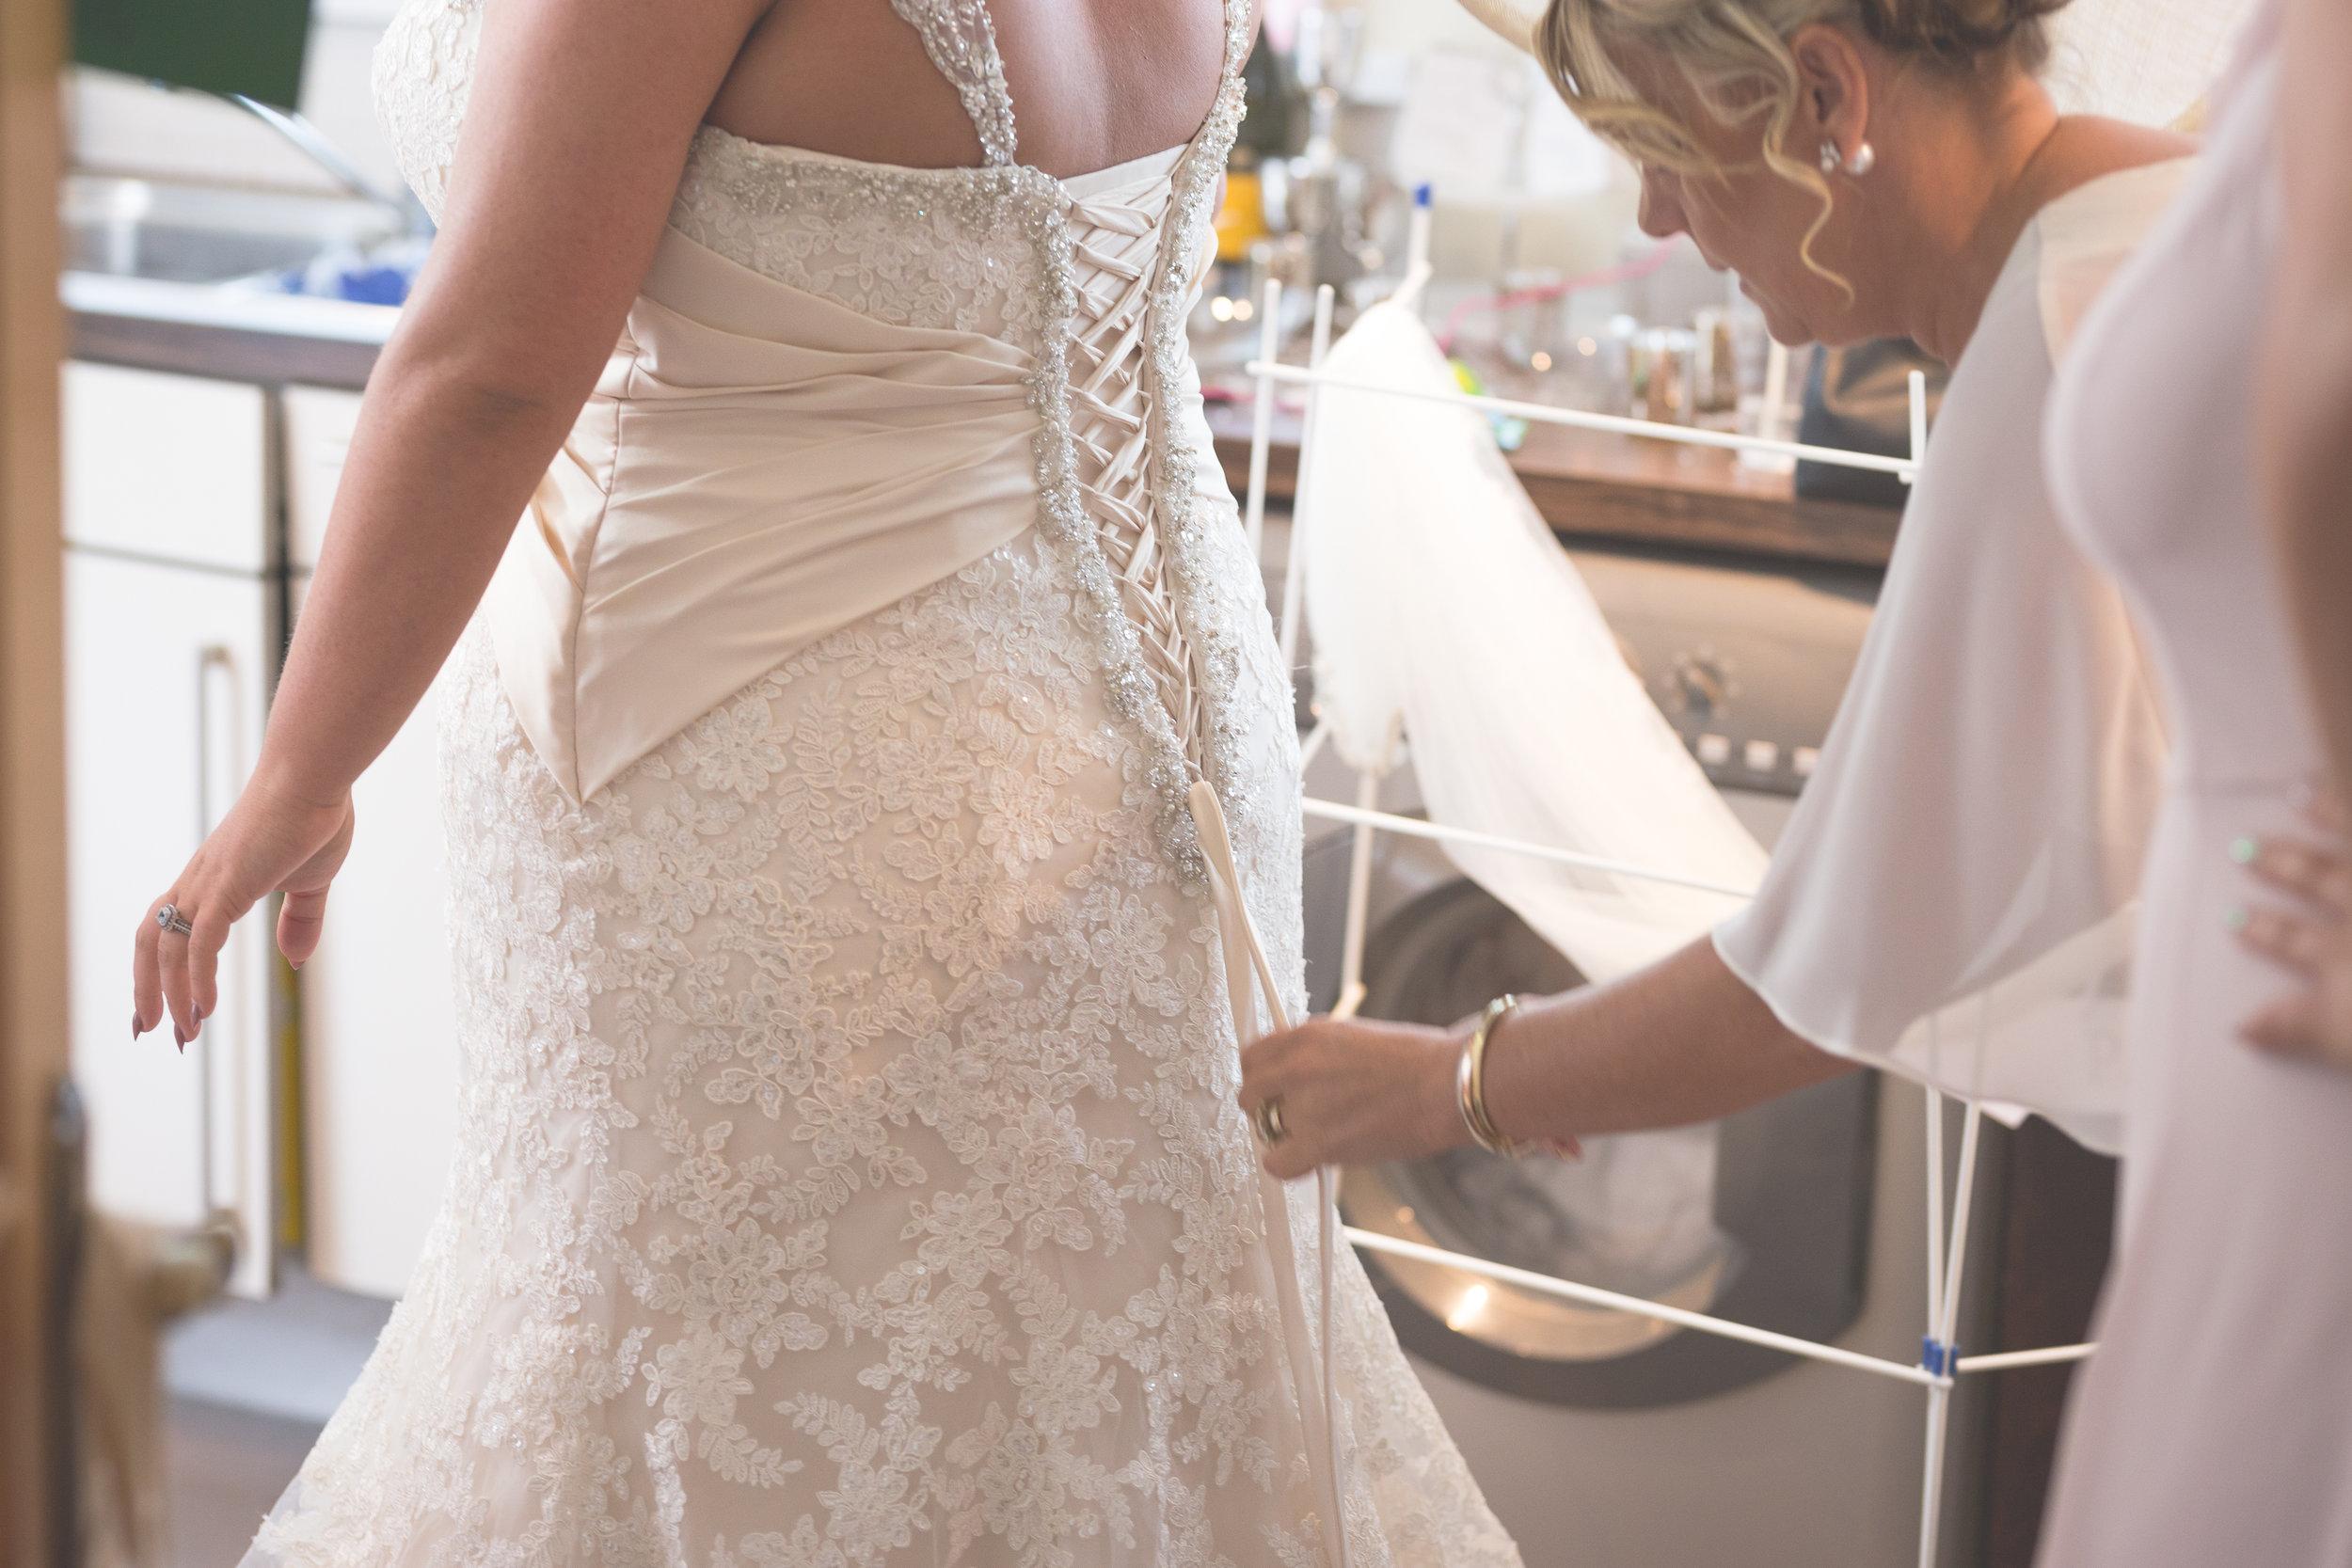 Antoinette & Stephen - Bridal Preparations | Brian McEwan Photography | Wedding Photographer Northern Ireland 158.jpg